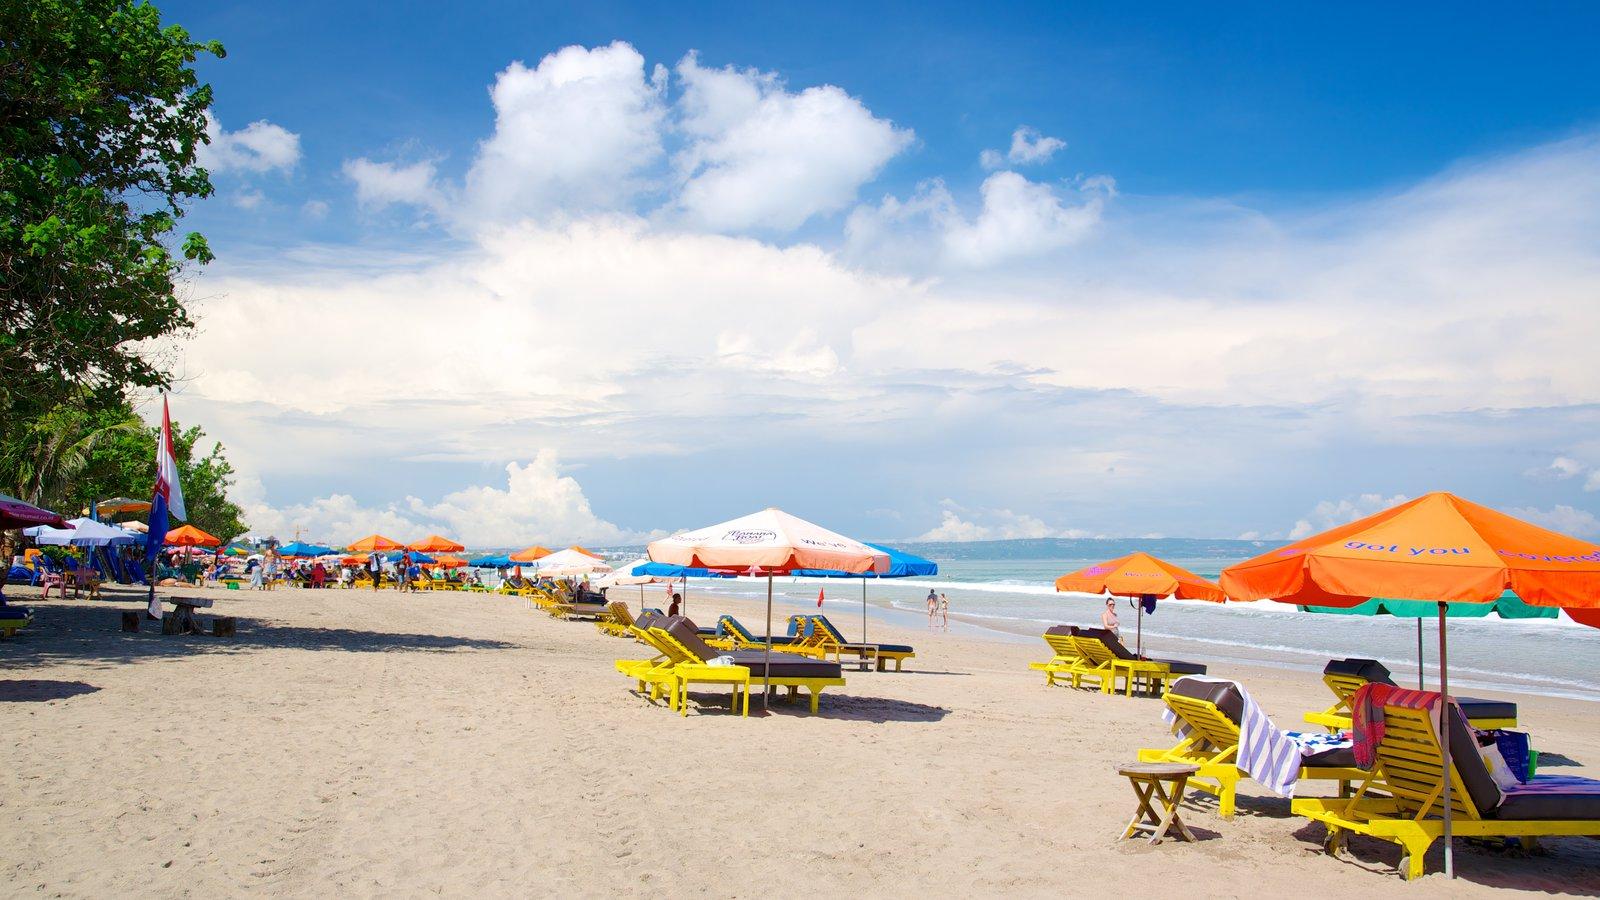 Nature Pictures View Images Double Beach Pantai Kab Badung